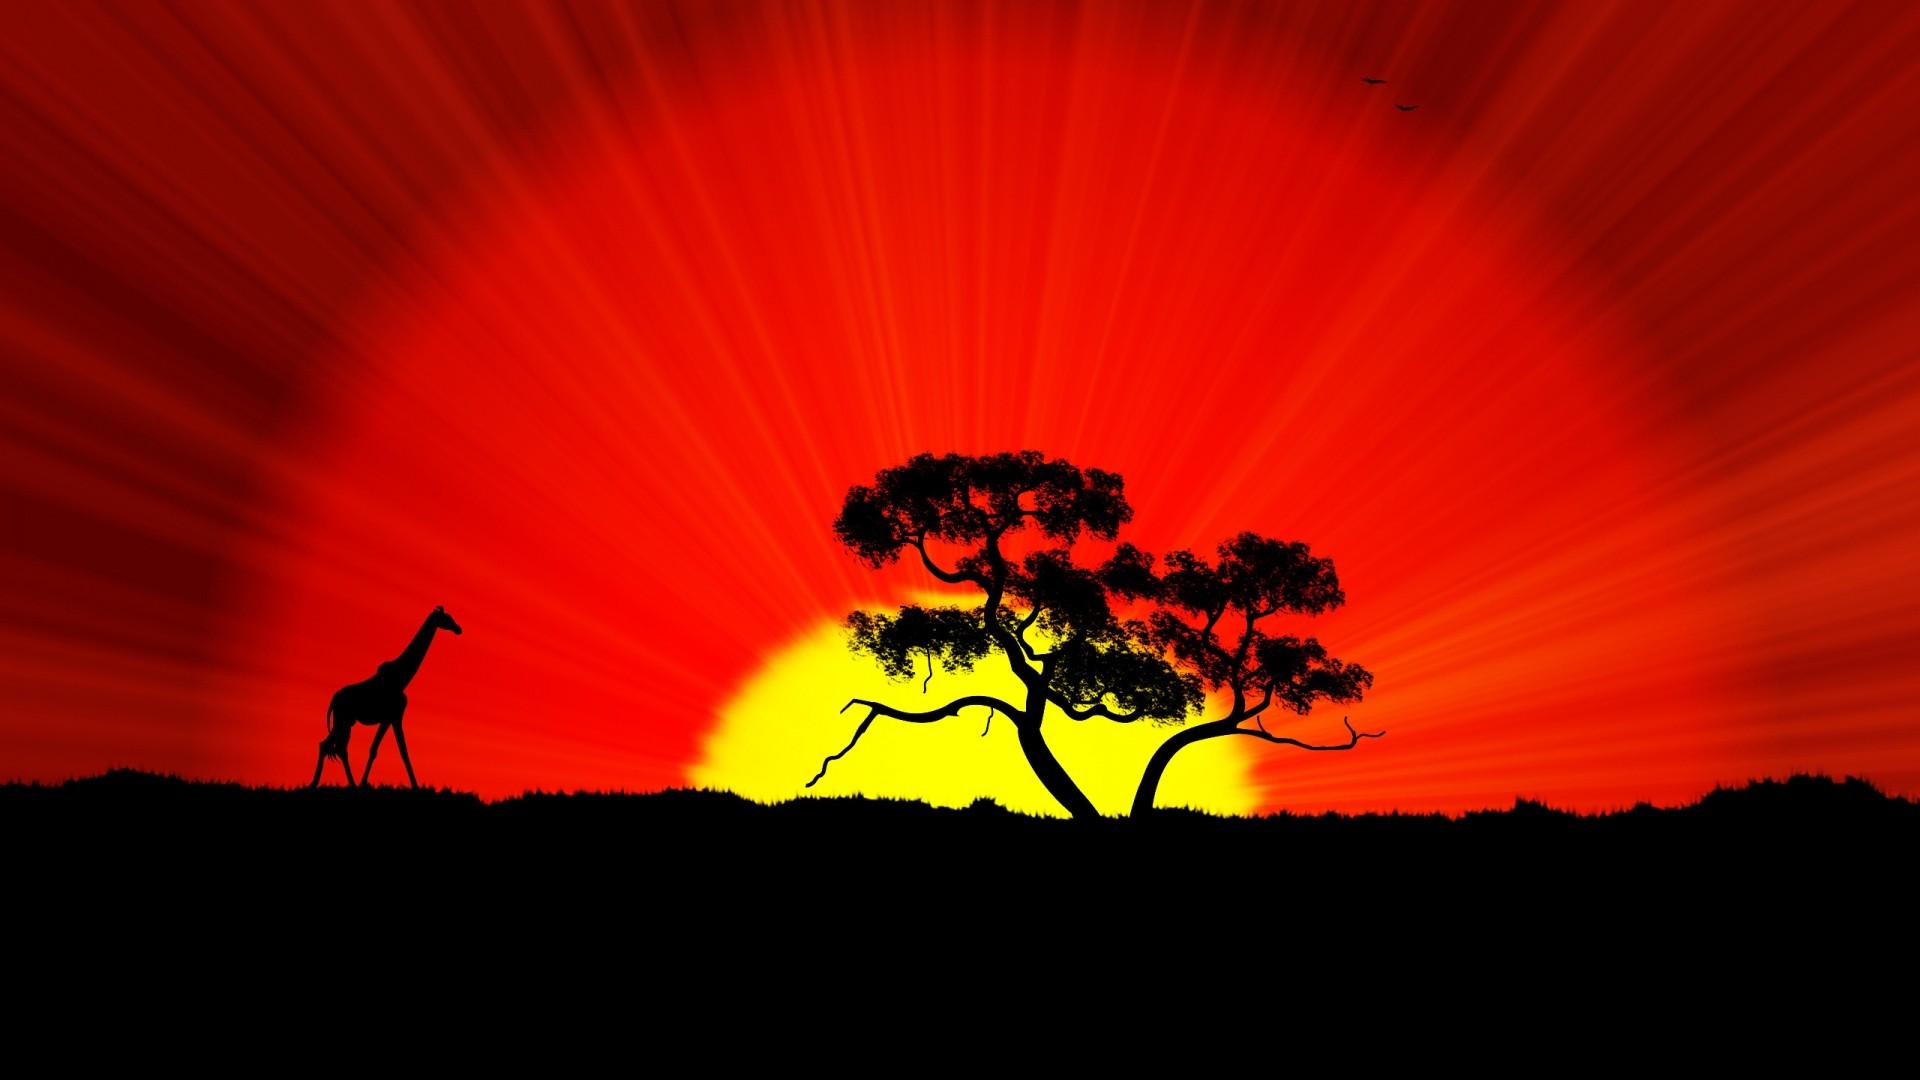 African Landscape Sunset Background Wallpaper